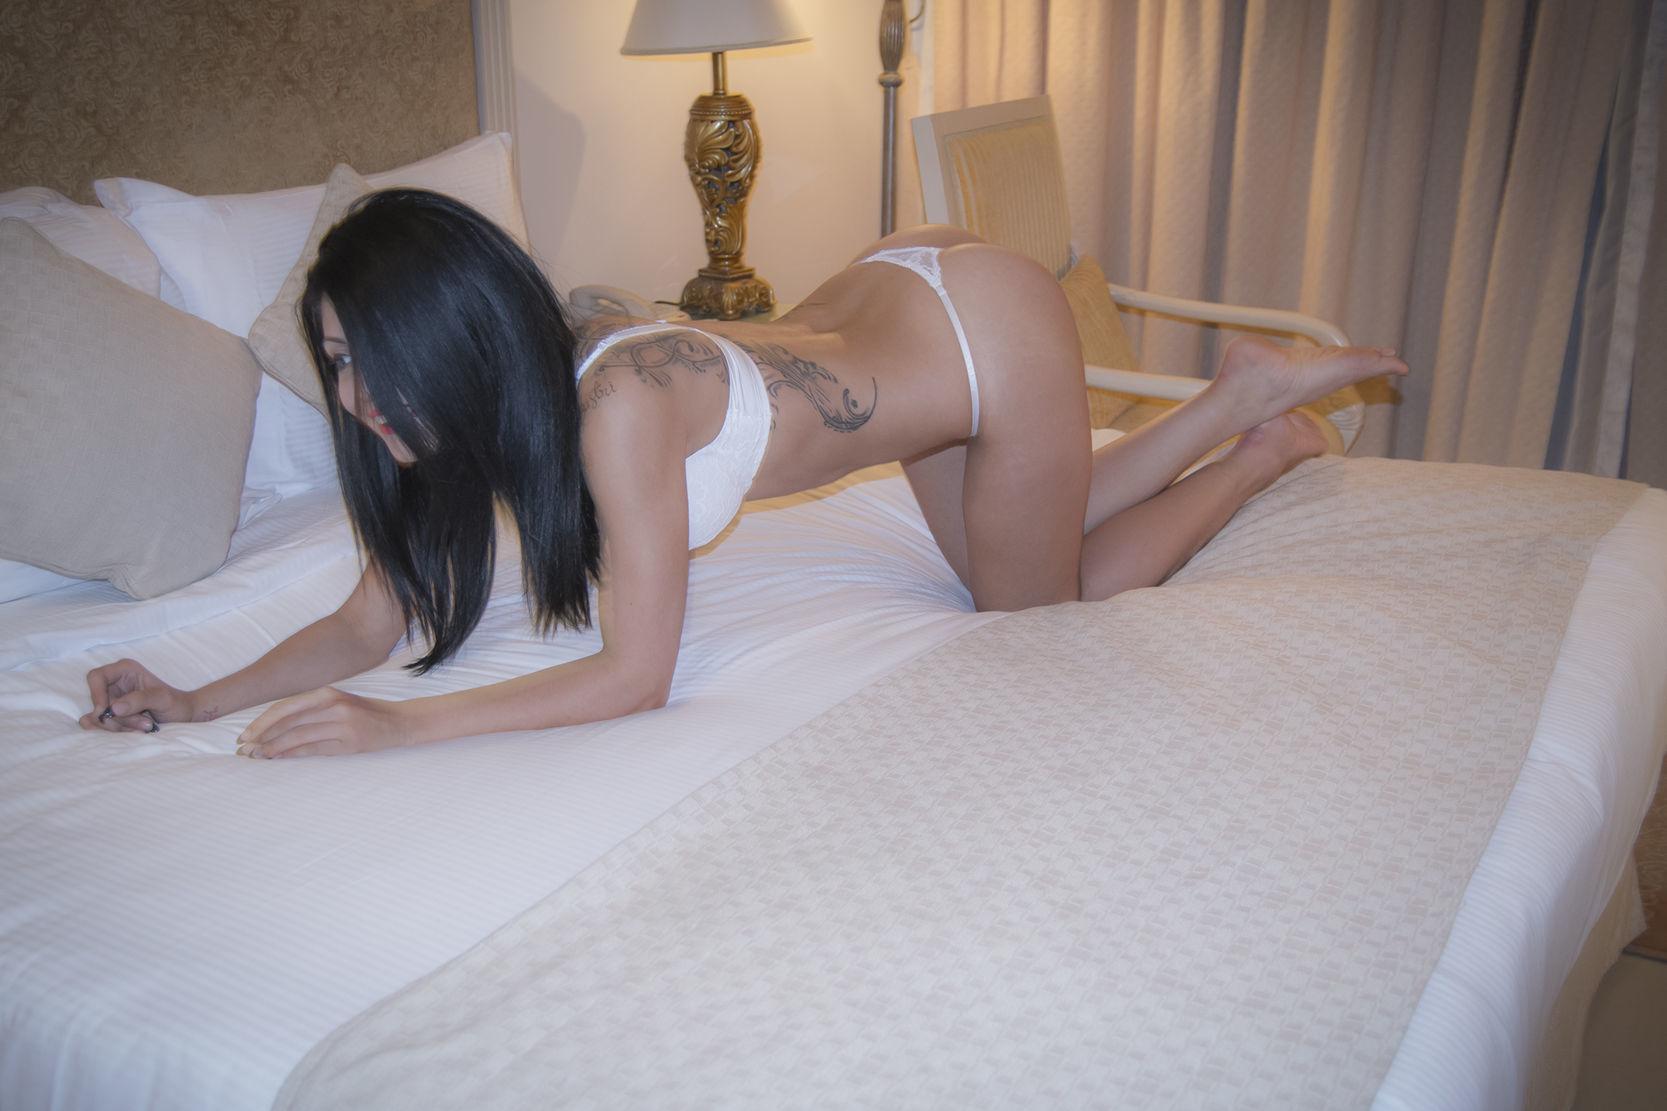 Korean call girls in ridgecrest ca, tantra massage